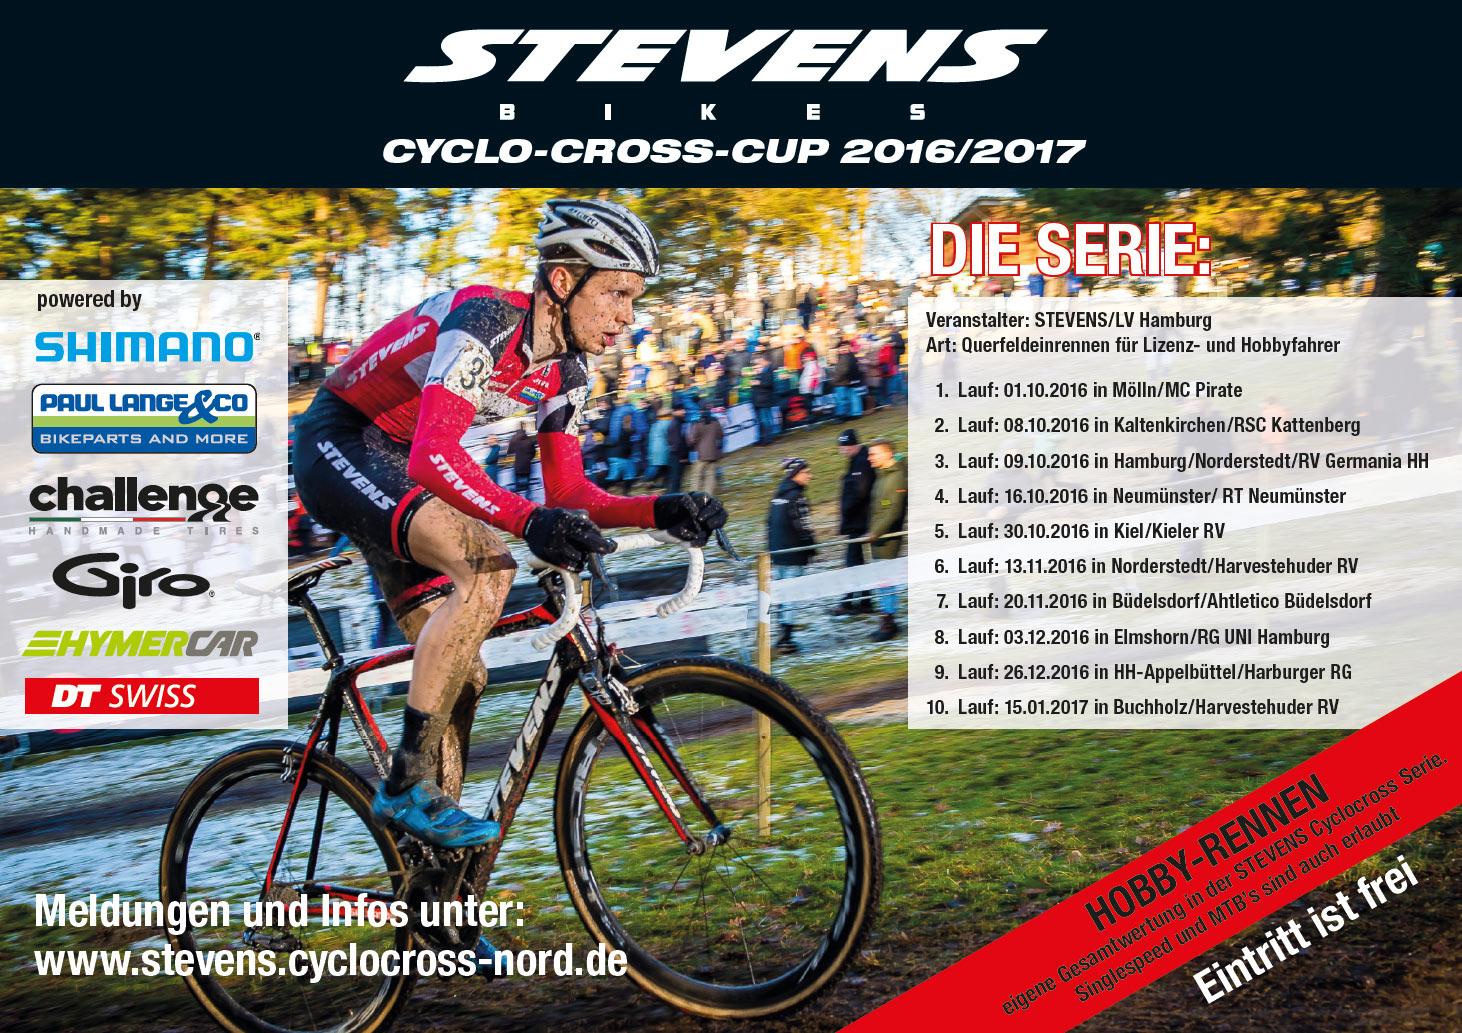 Stevens Cyclocross Cup 2016/2017